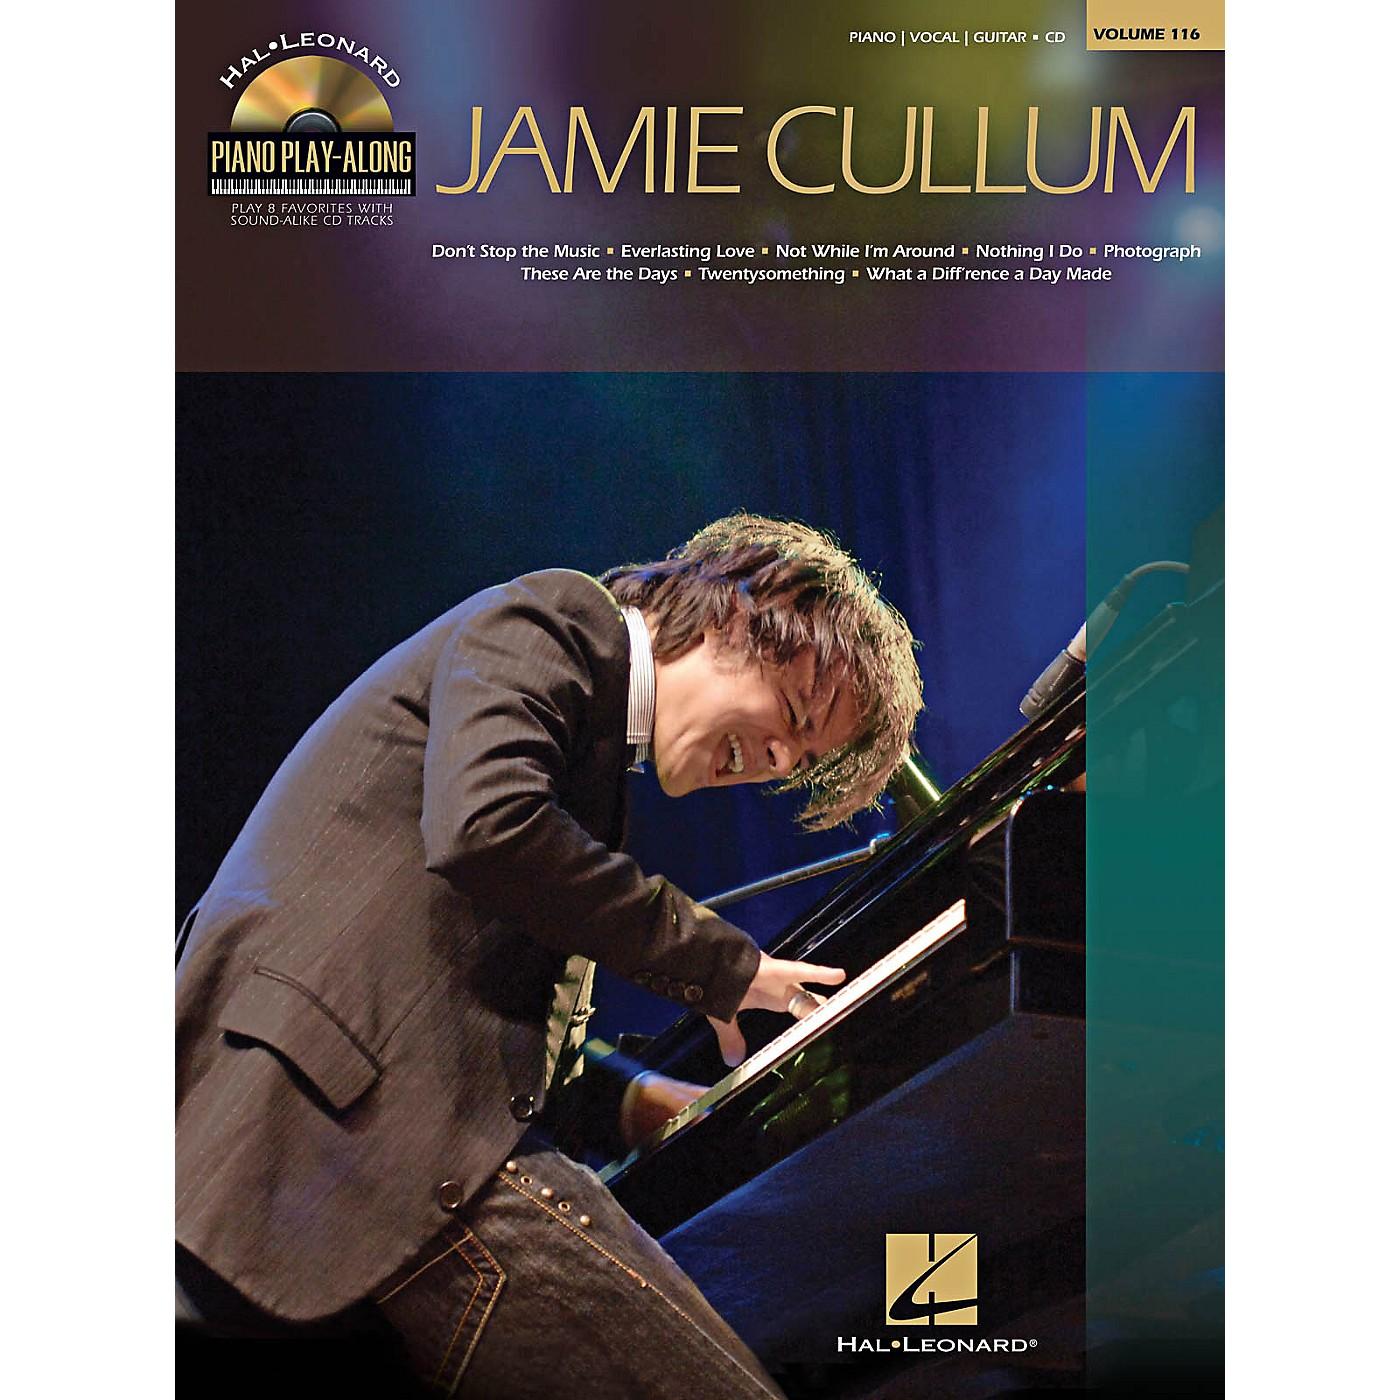 Hal Leonard Jamie Cullum - Piano Play-Along Series Volume 116 Book/CD thumbnail